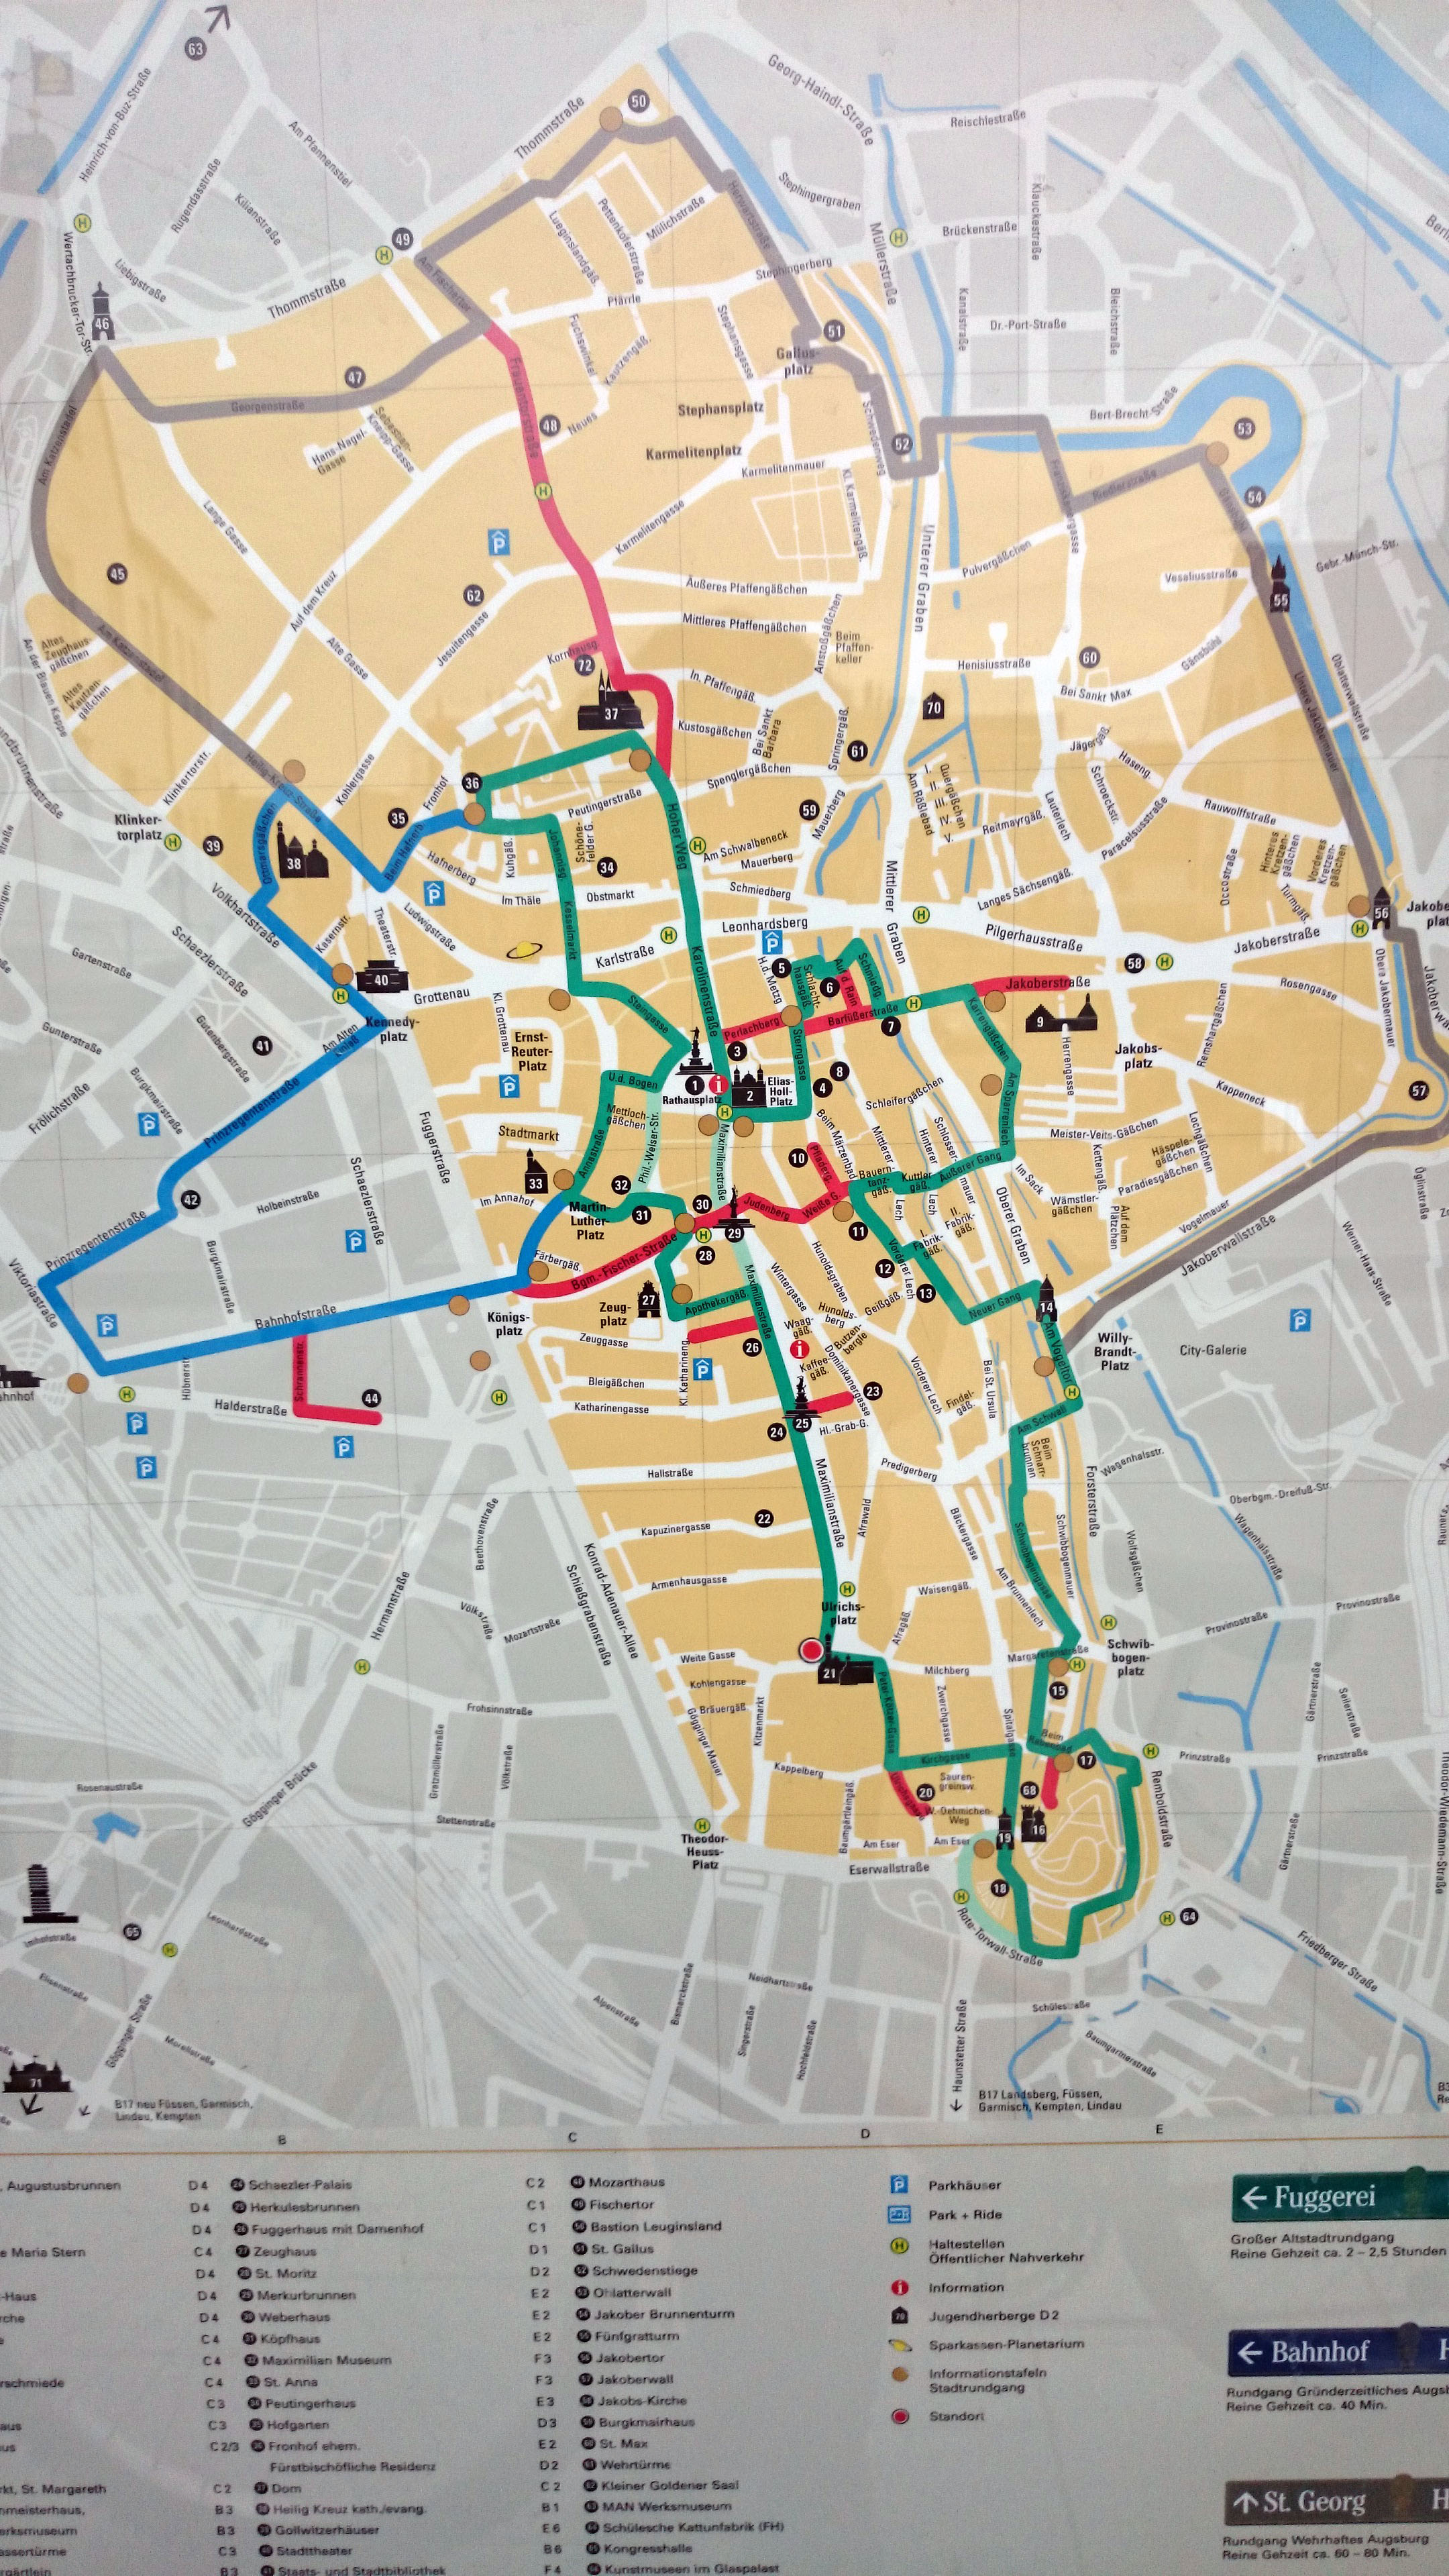 plano augsburgo